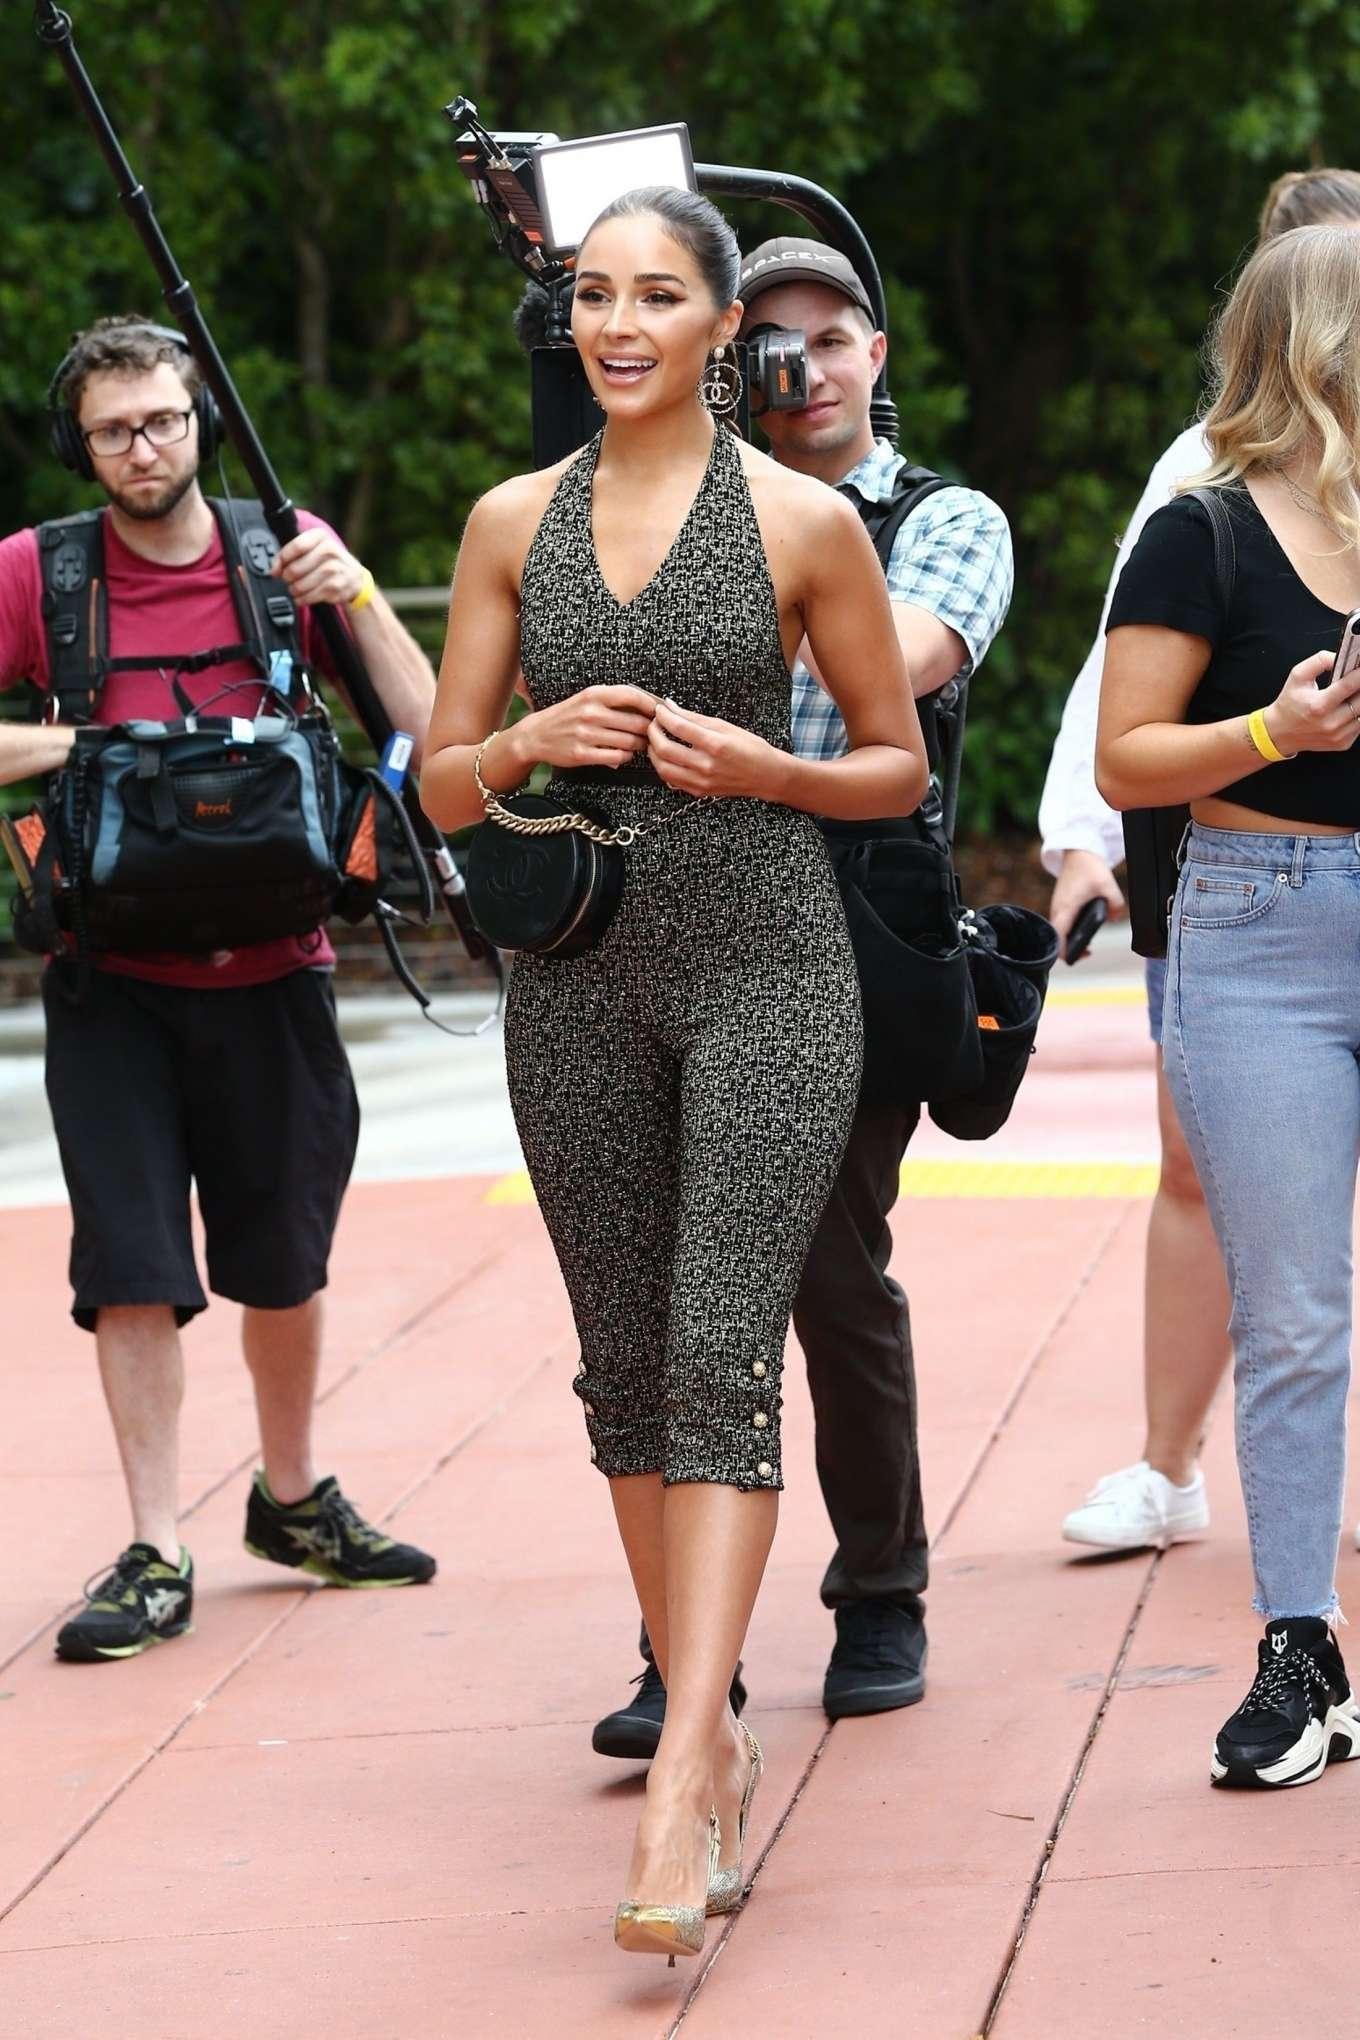 Olivia Culpo 2019 : Olivia Culpo – Attends a casting call for Sports Illustrated-08